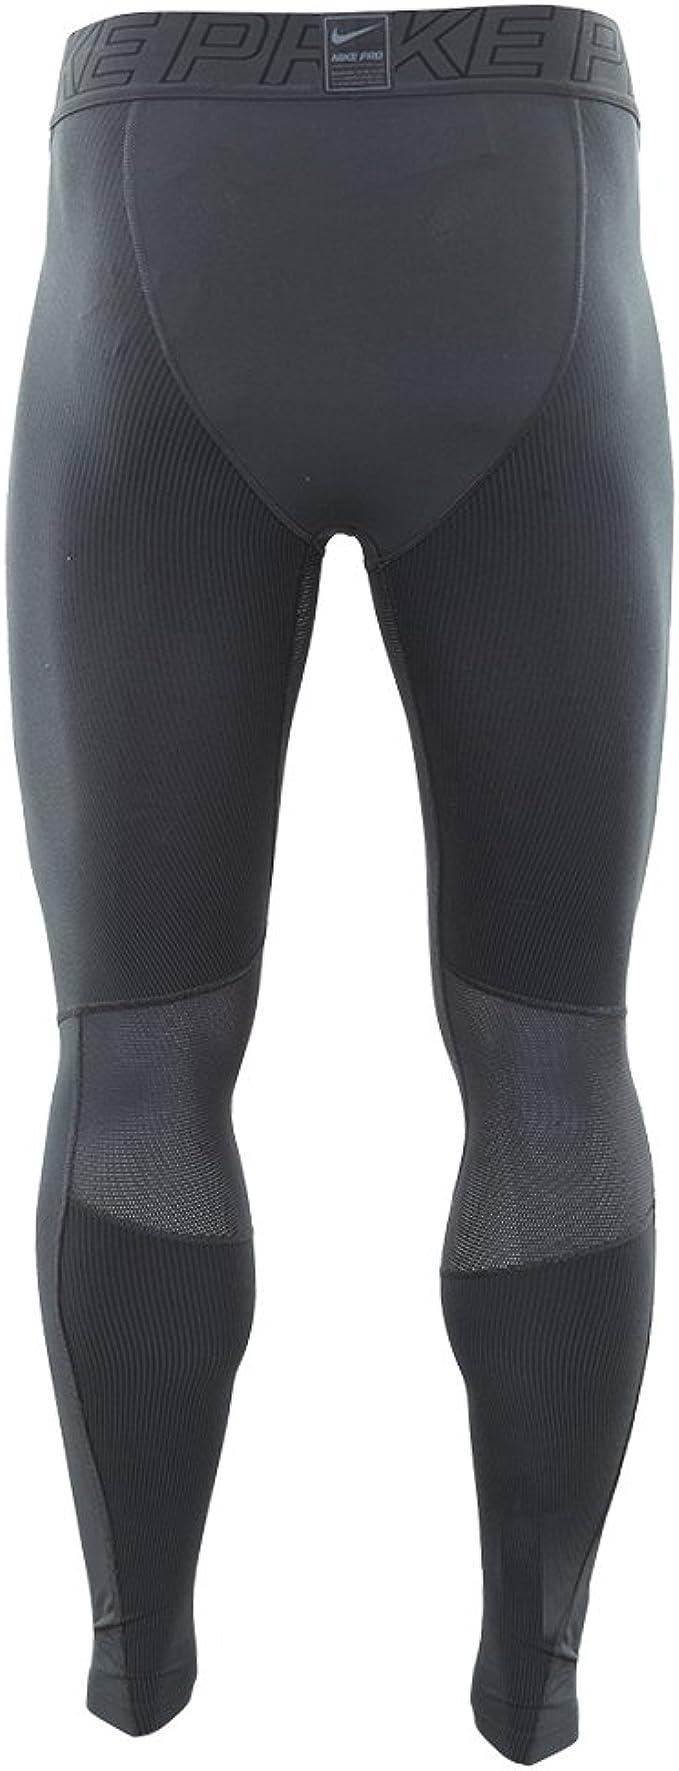 NIKE Training Pants Grey S Cool Tgt Nike